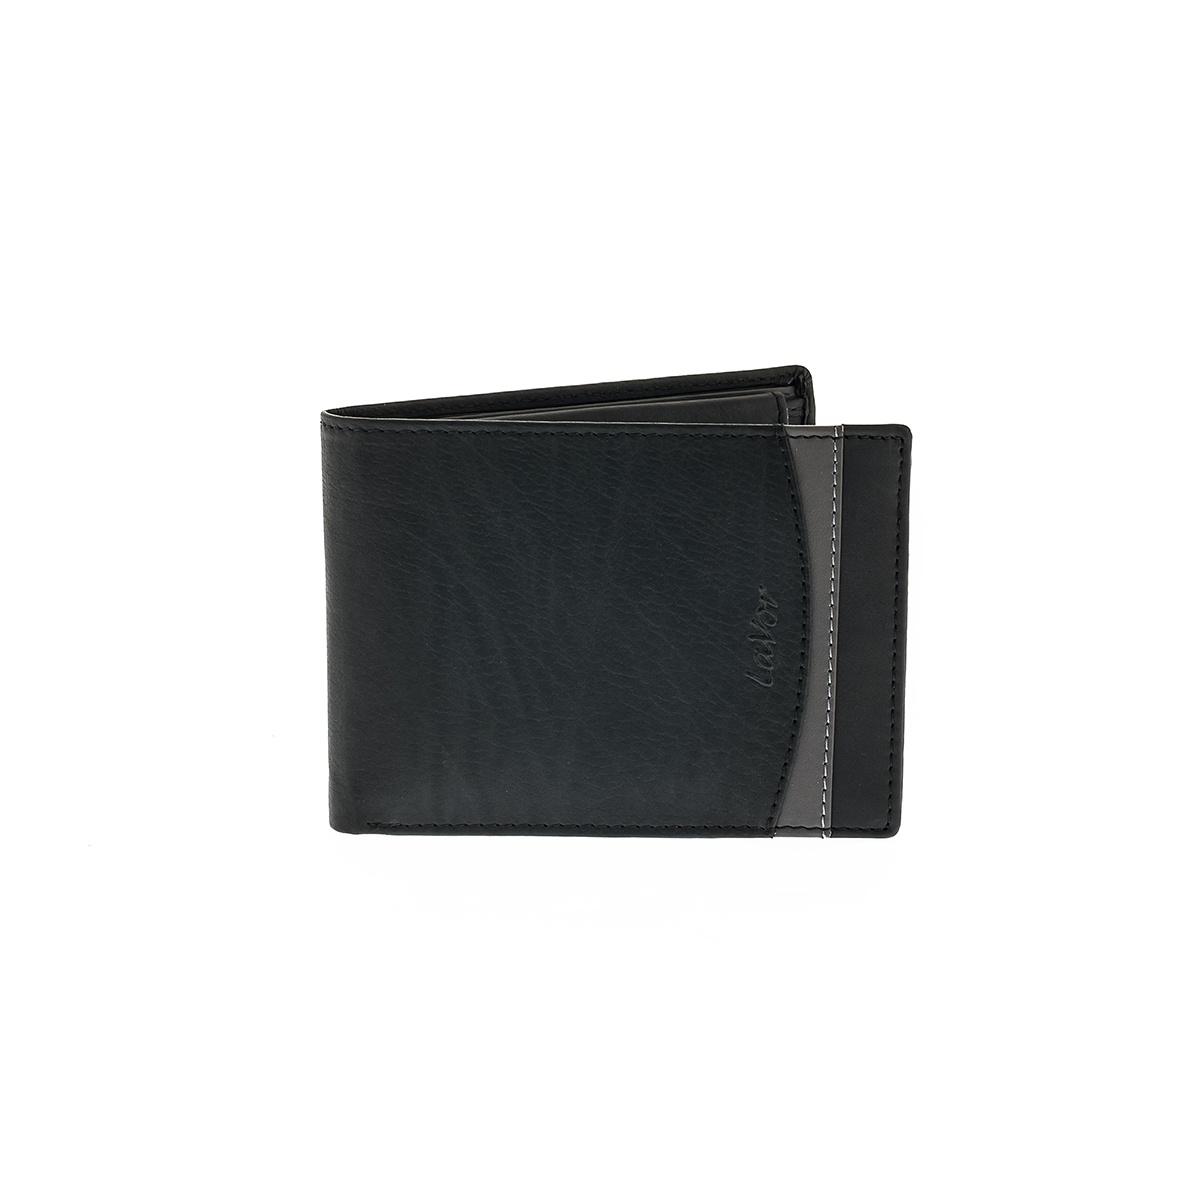 Bagsin-Lavor-5802-01-black